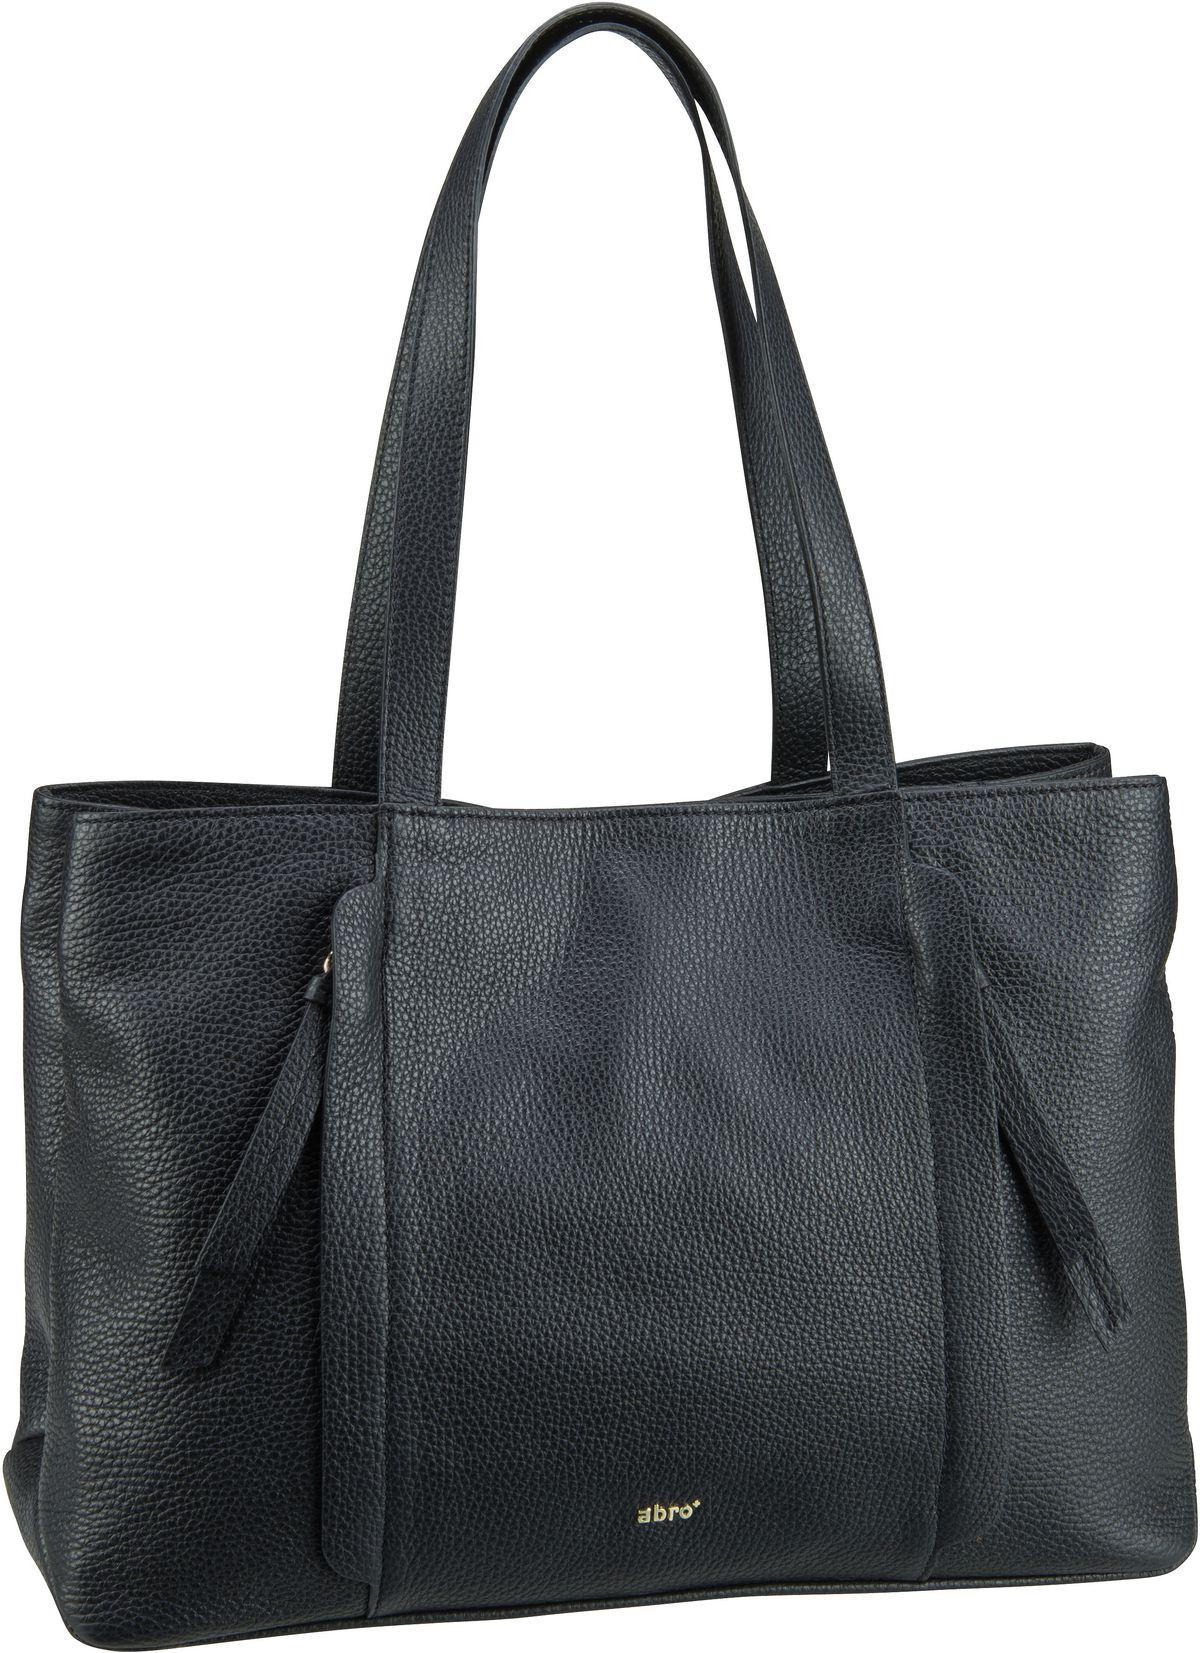 Handtasche Calf Adria 28629 Black